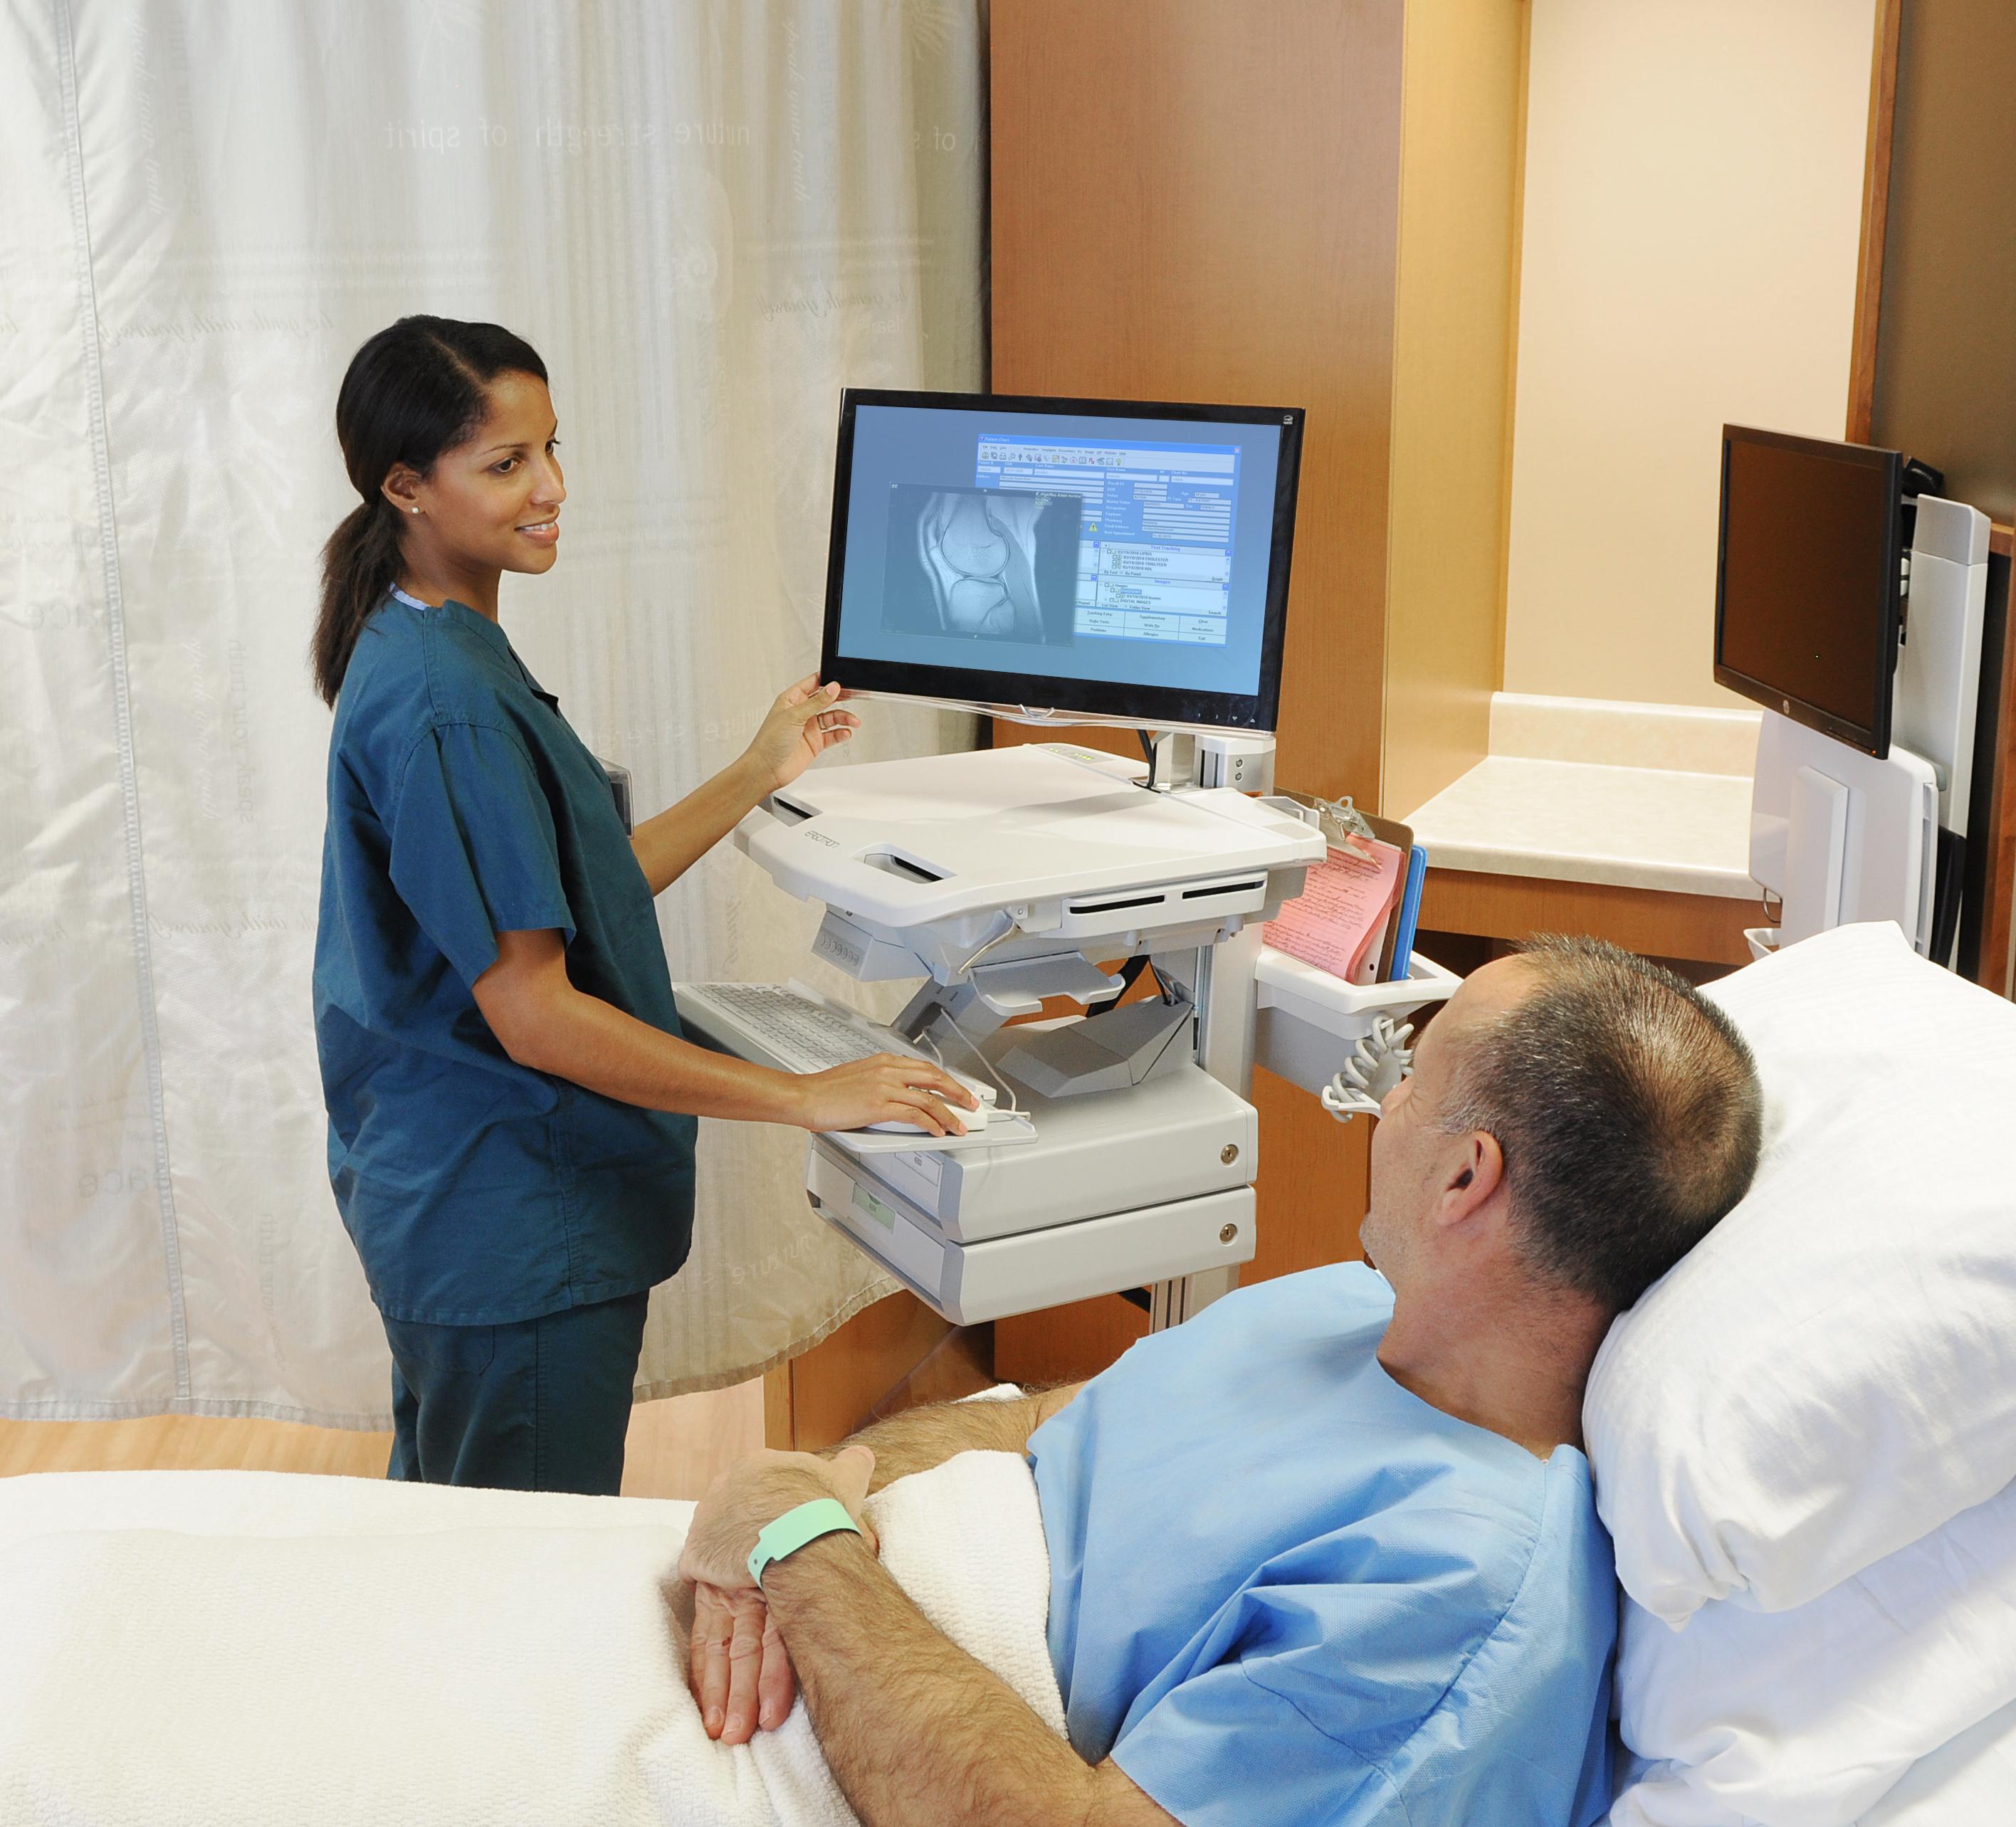 SV42 piv nurse patient room-hr